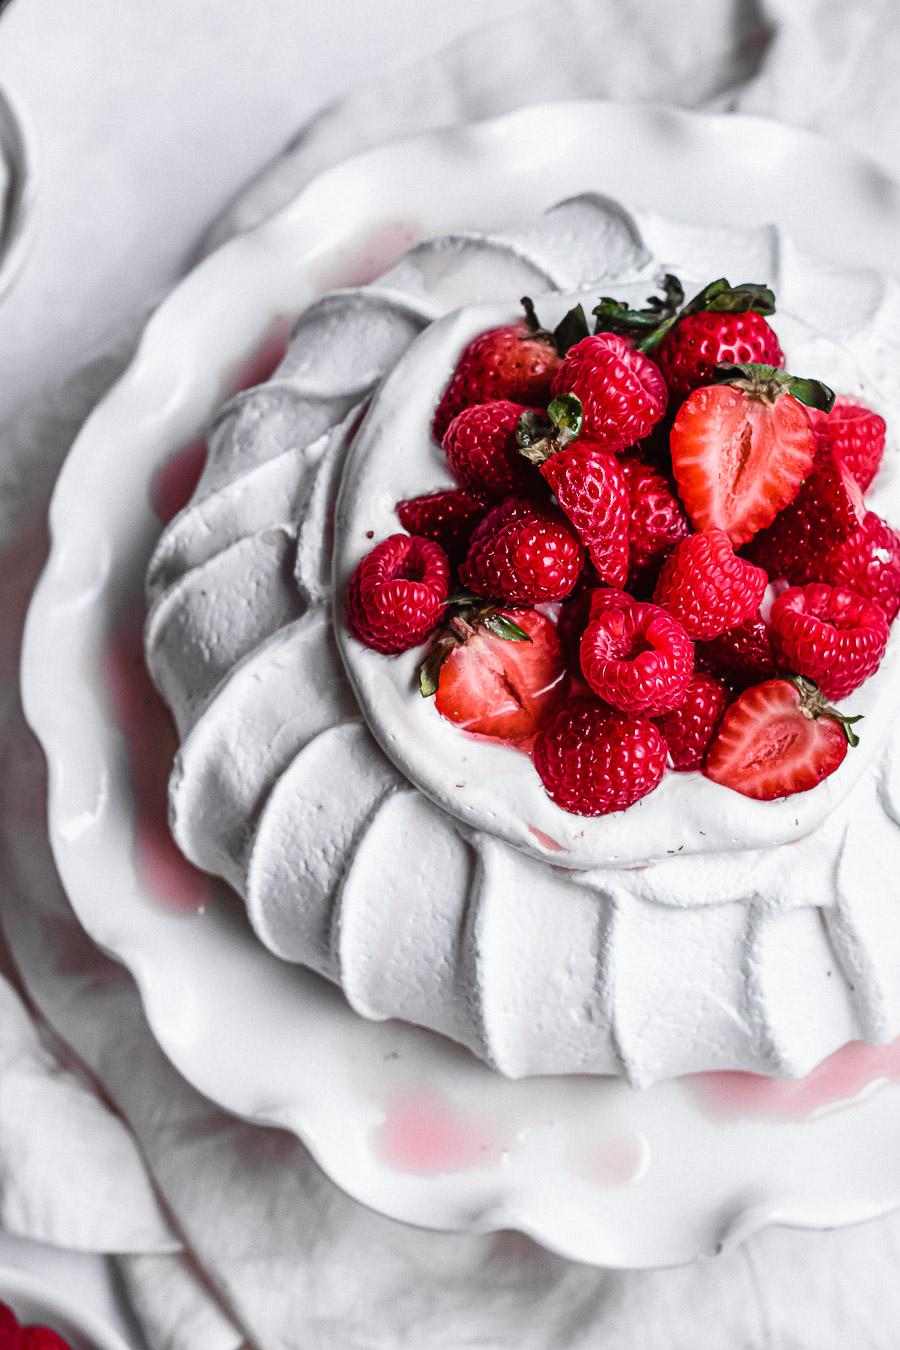 classic pavlova with berries